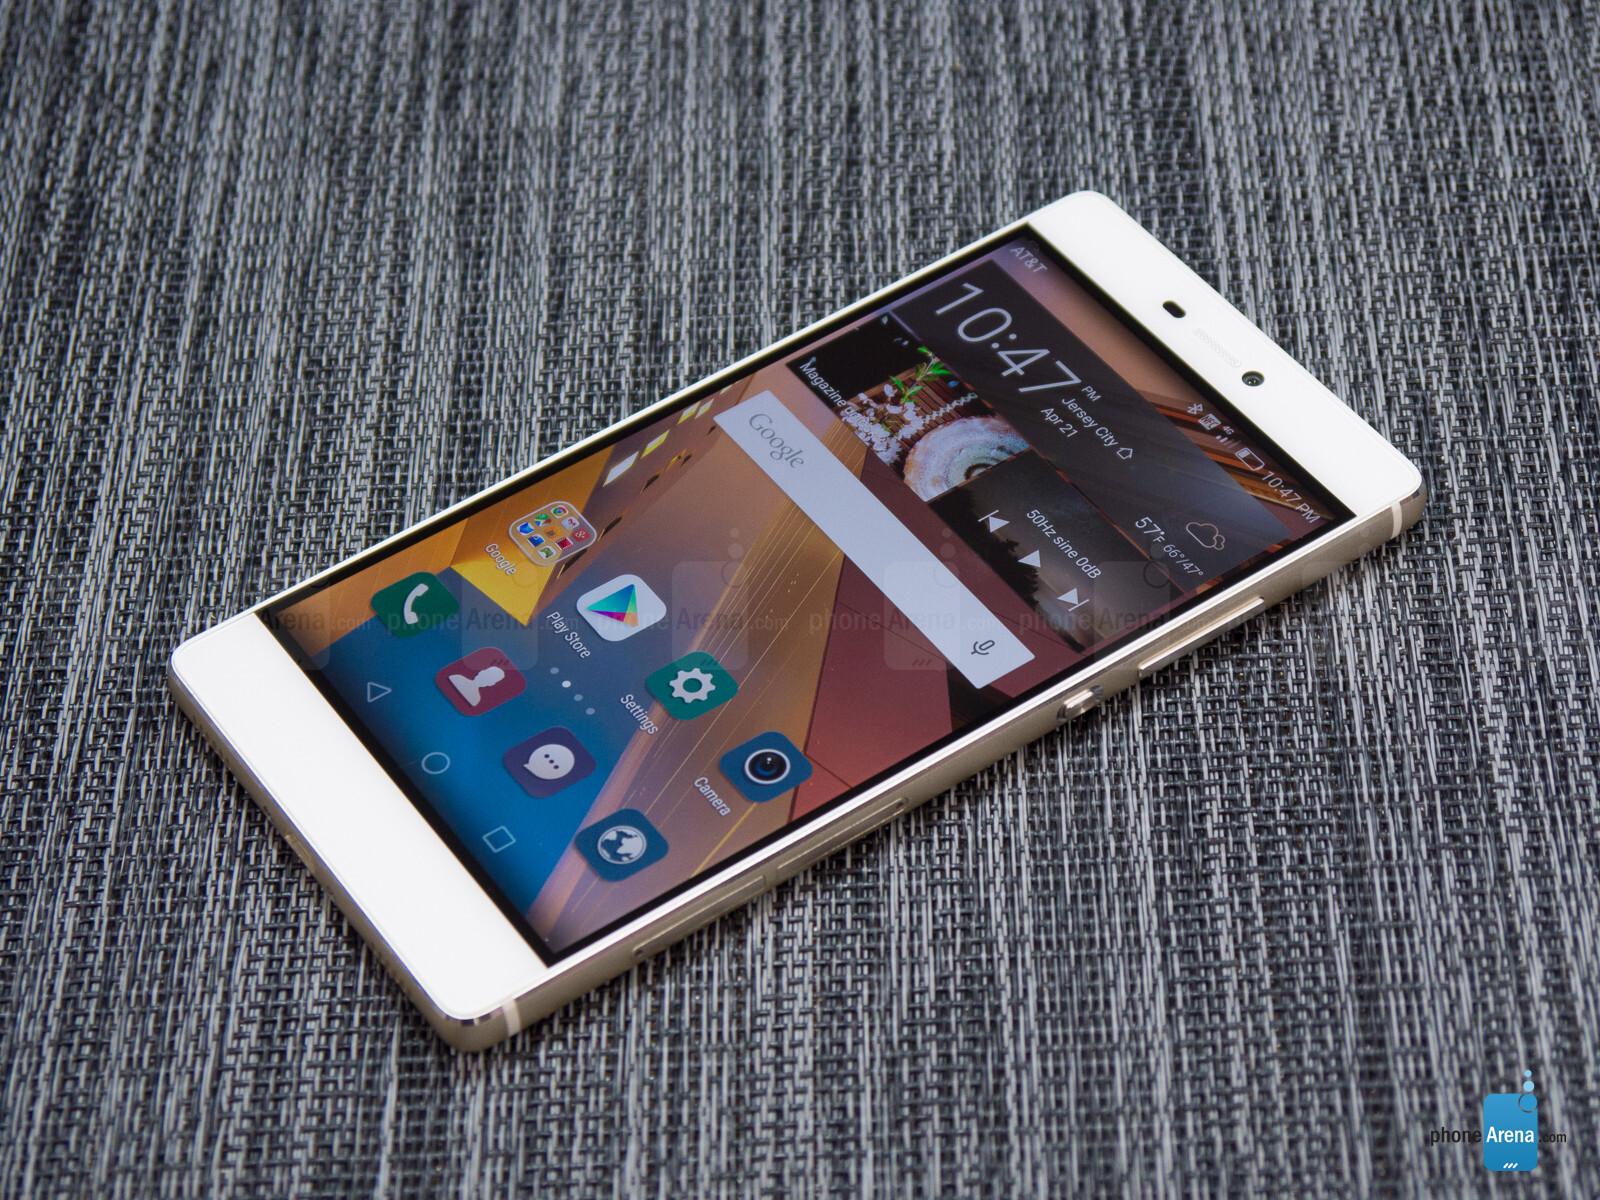 Huawei P8 Review - PhoneArena